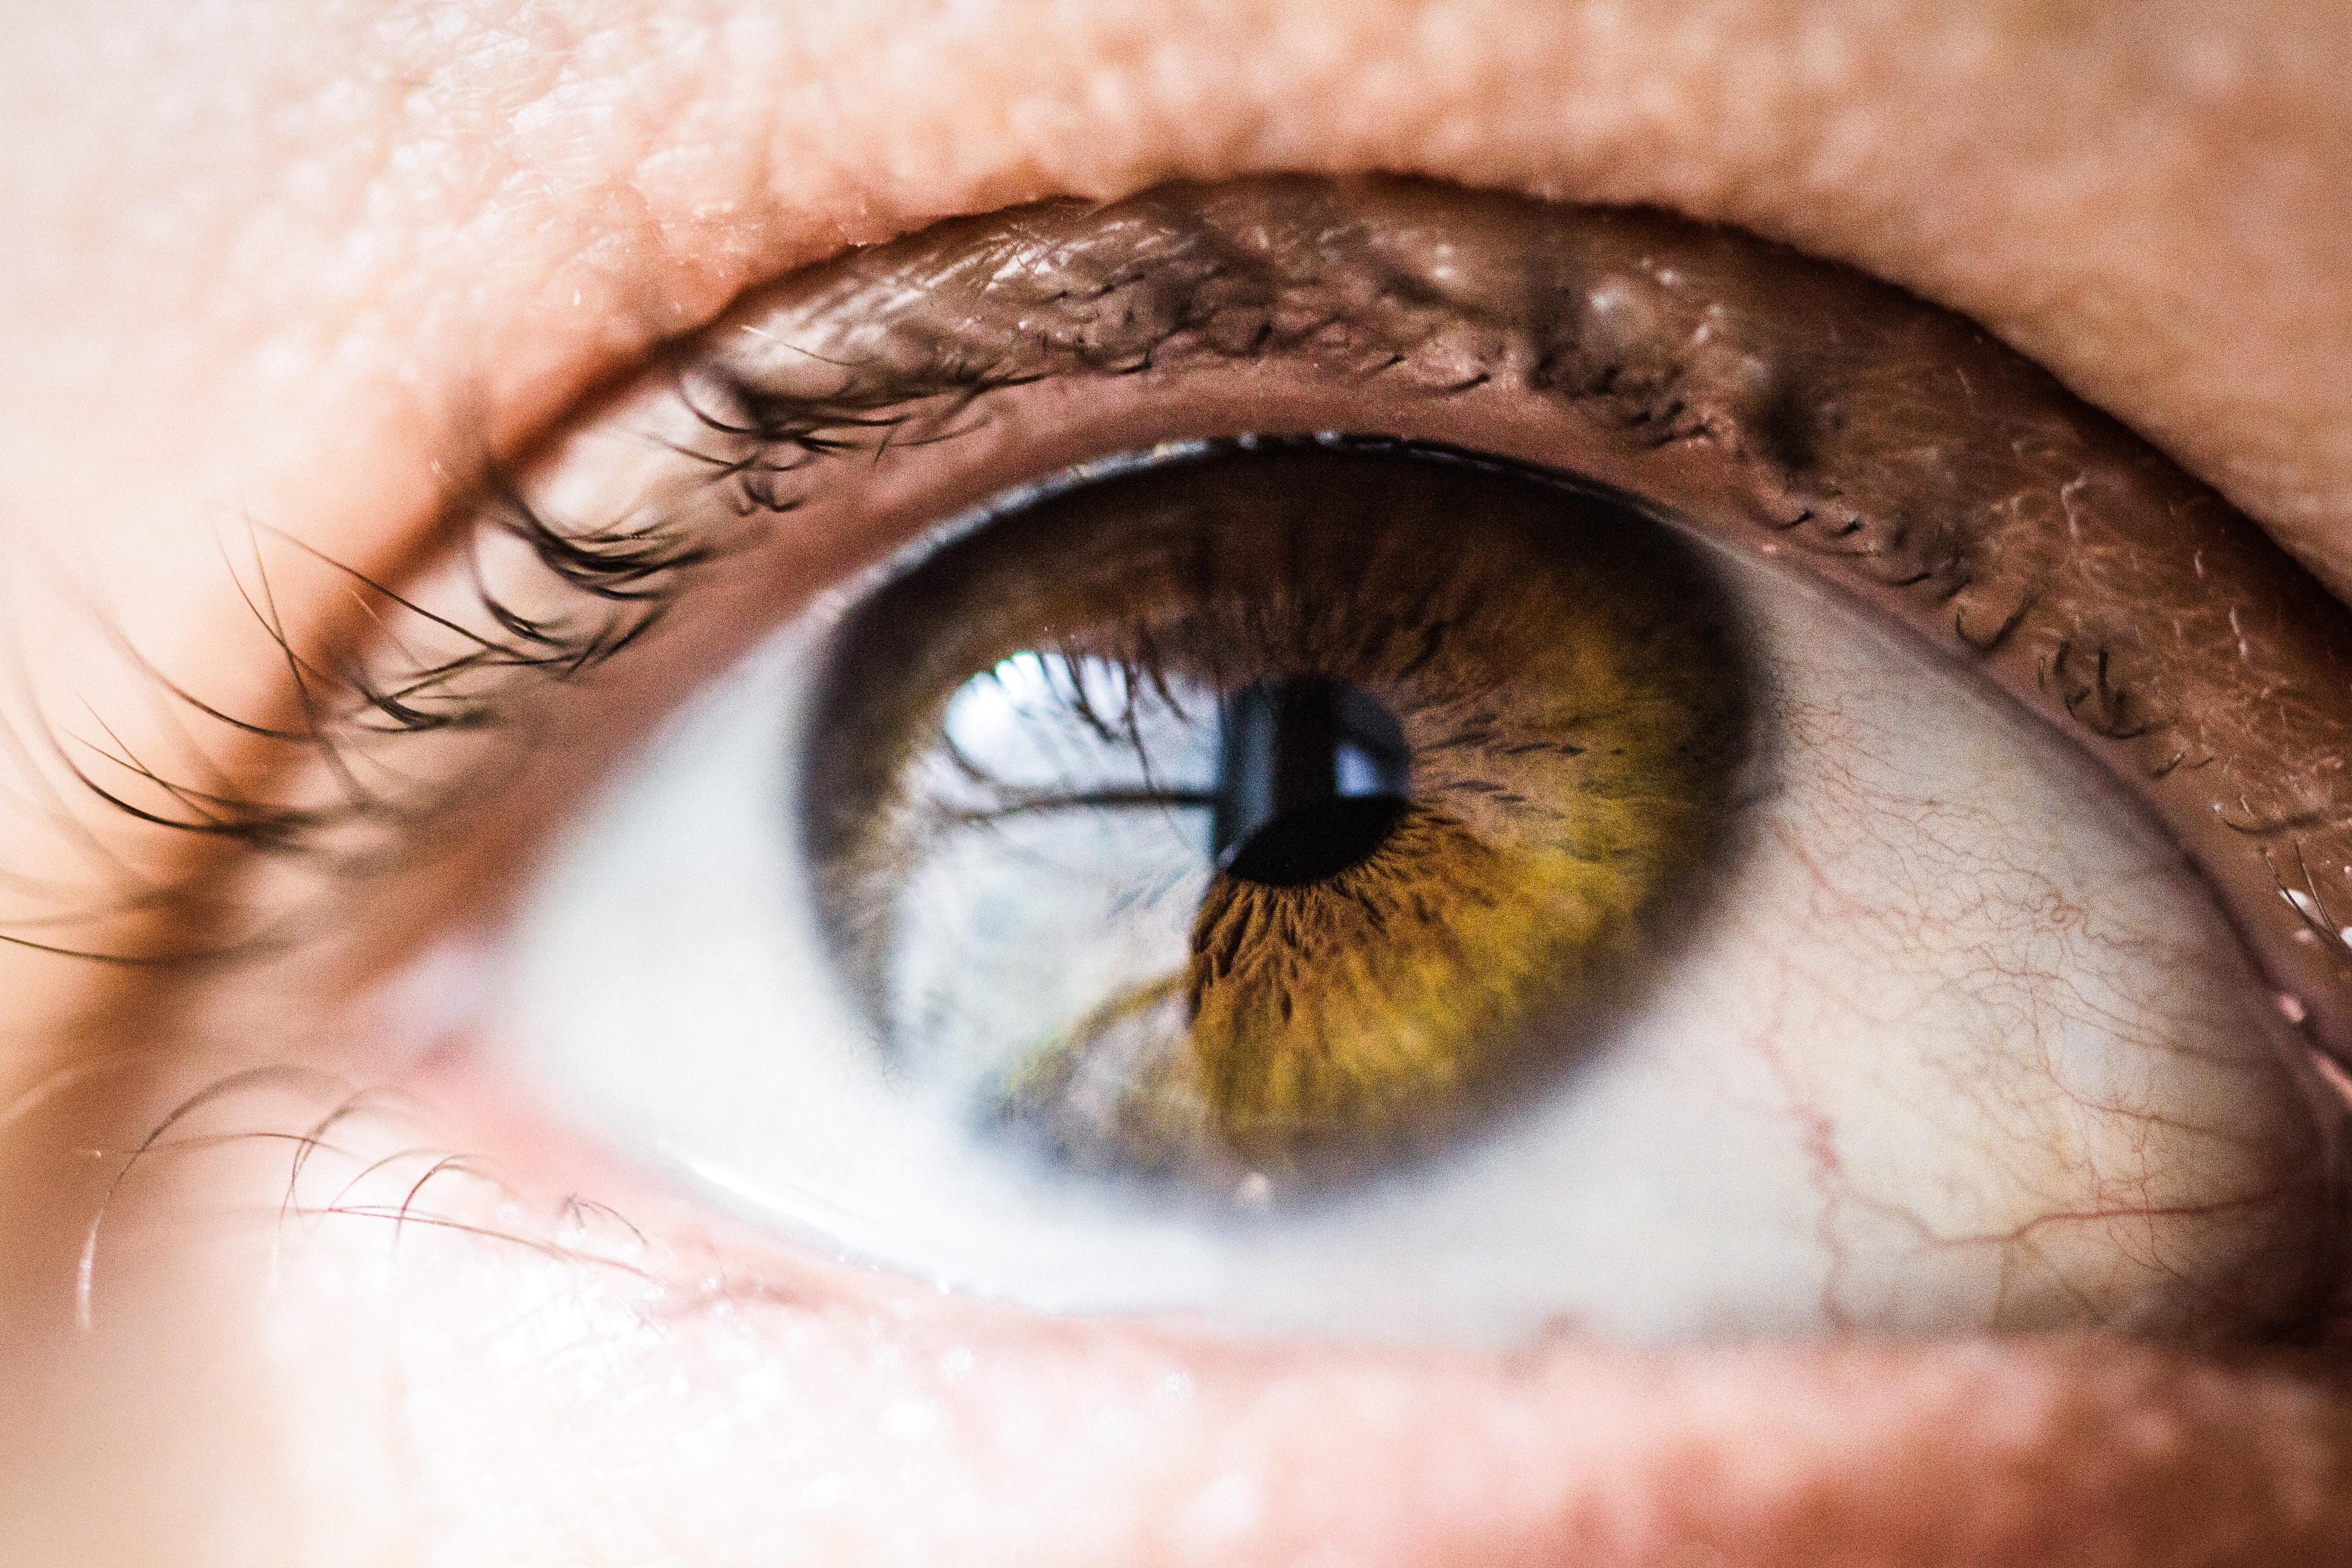 چشمانمان به دنبال چیست؟